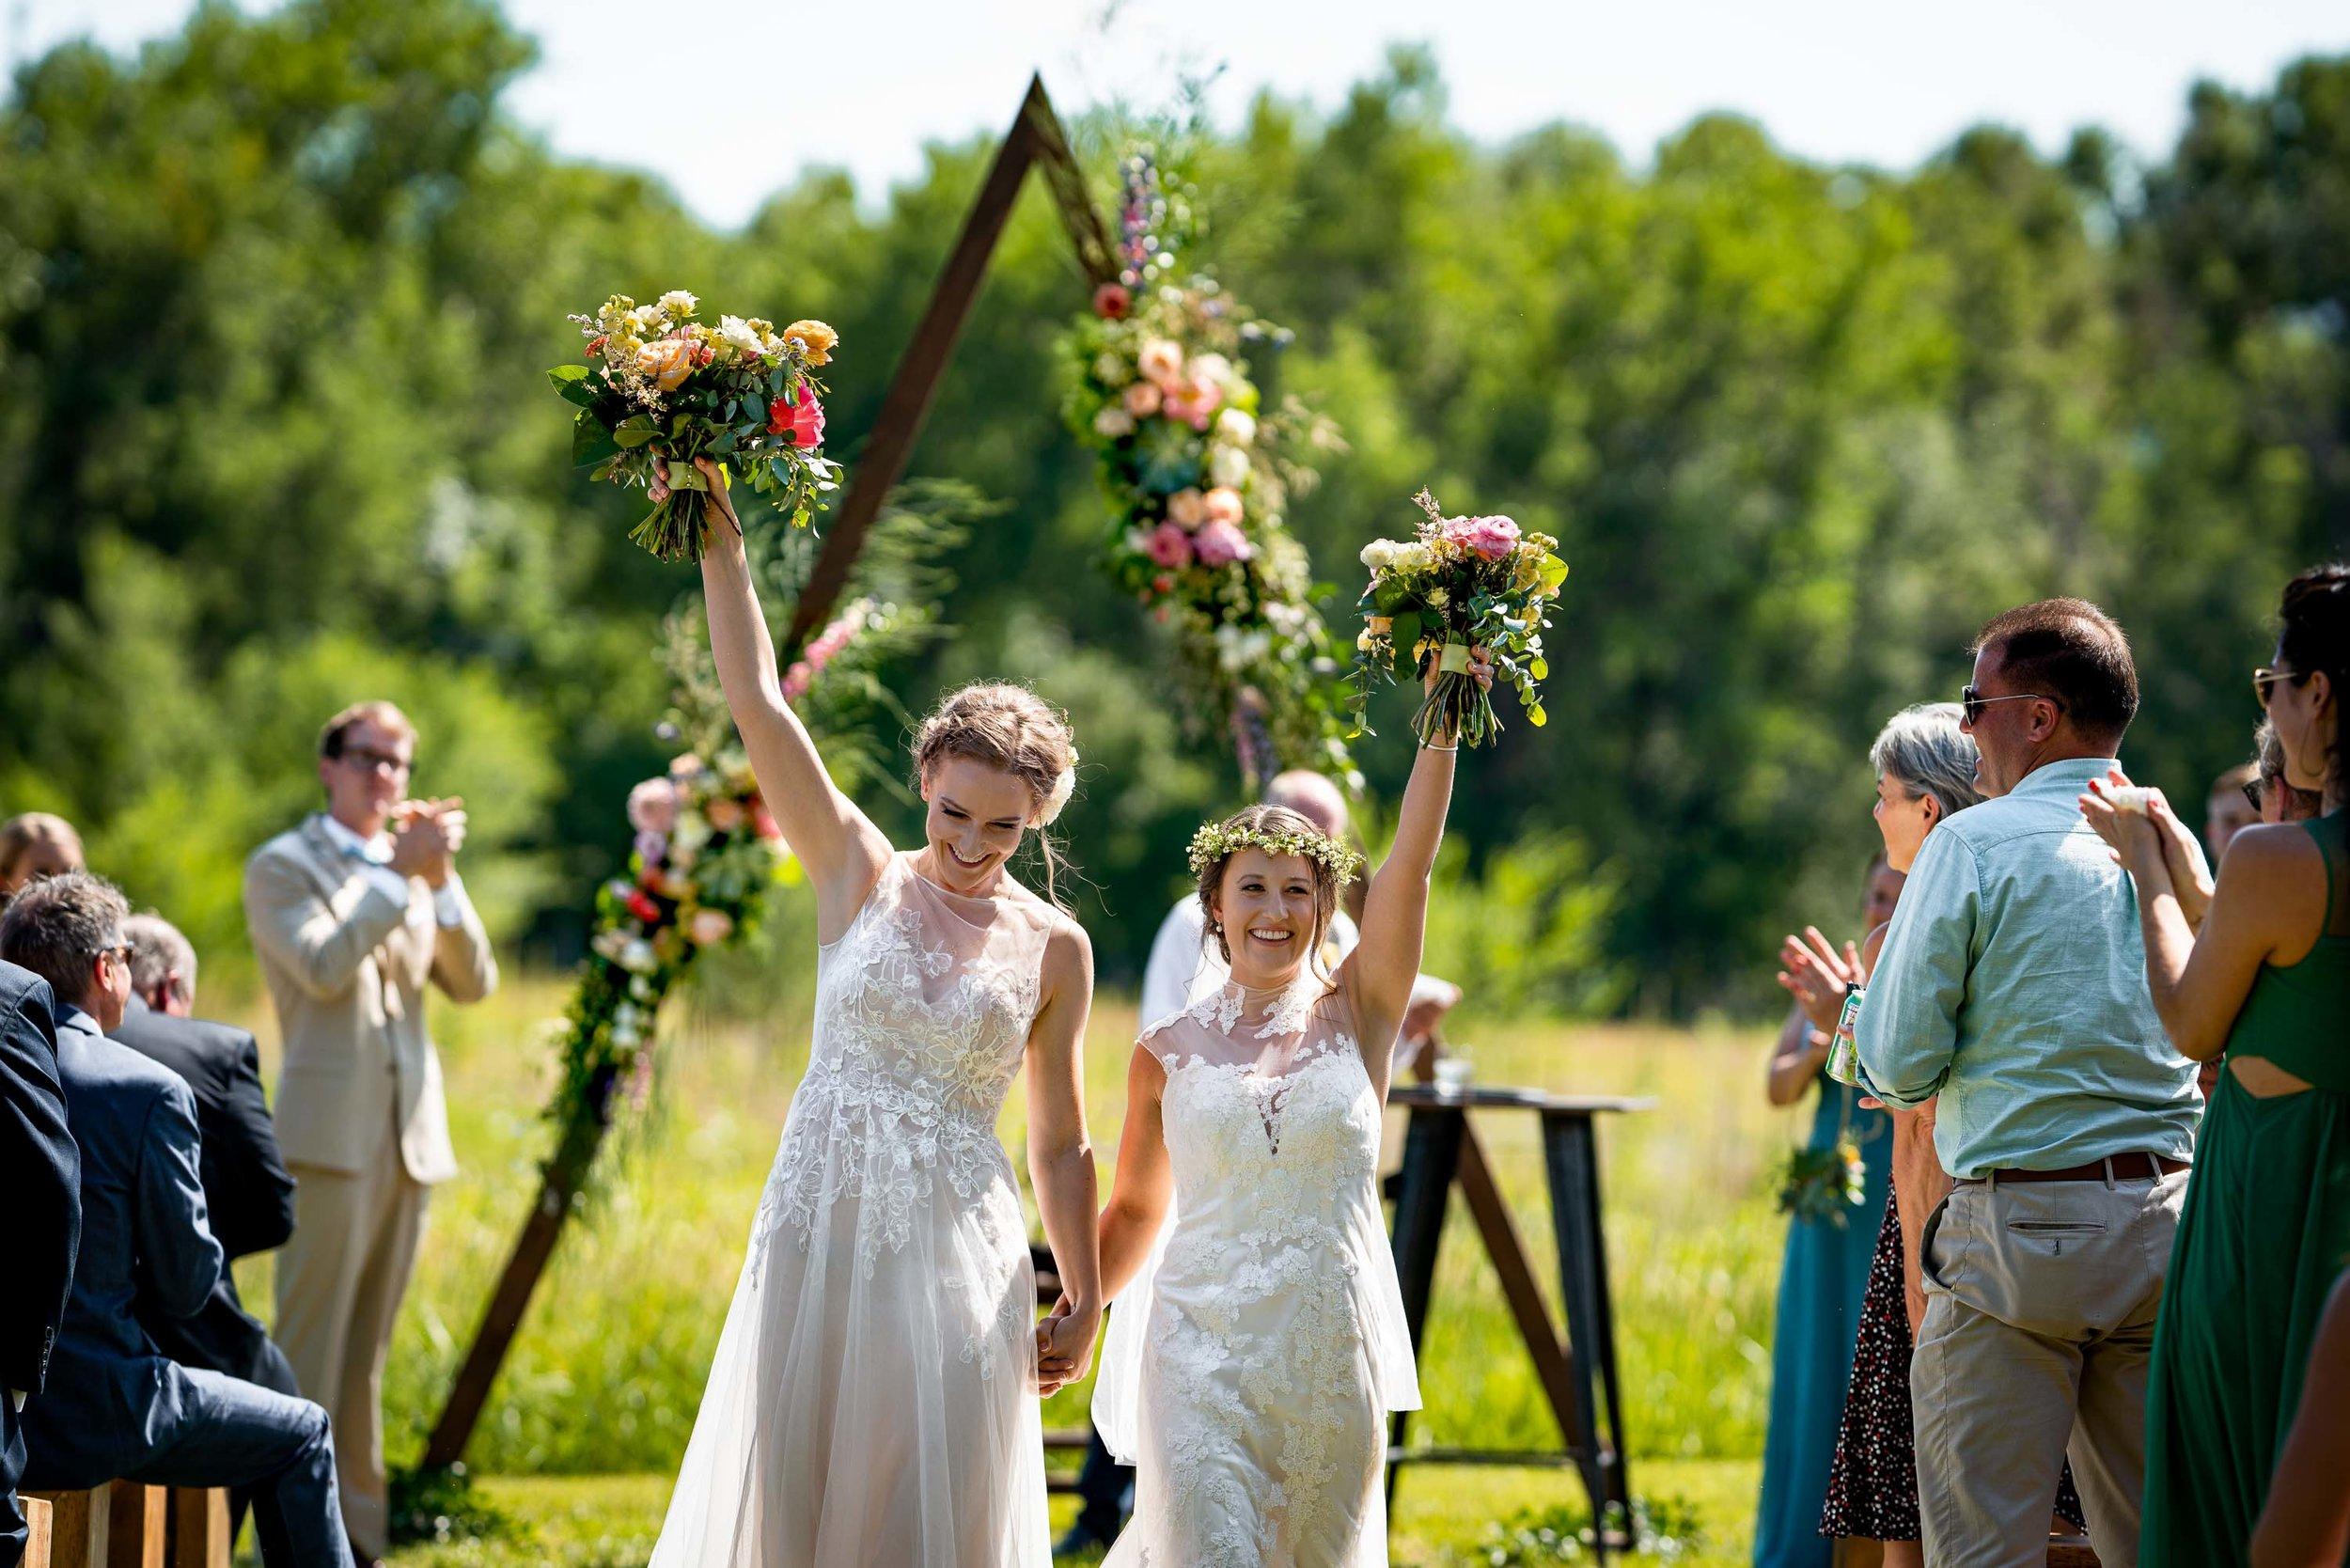 Rist_Canyon_Inn_Laporte_Wedding-106.jpg